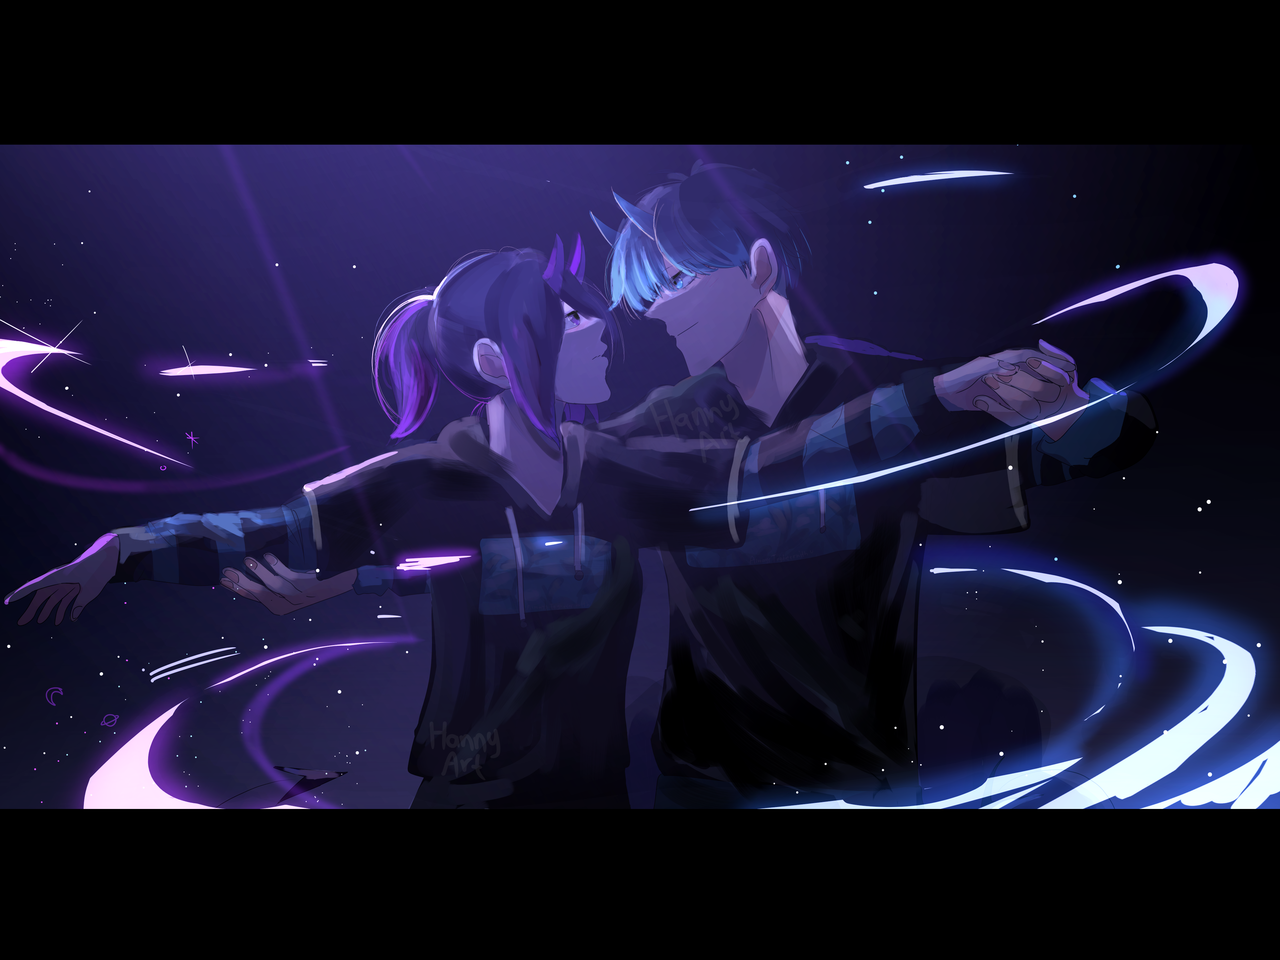 Dance with me in the dark  Illust of 23 medibangpaint